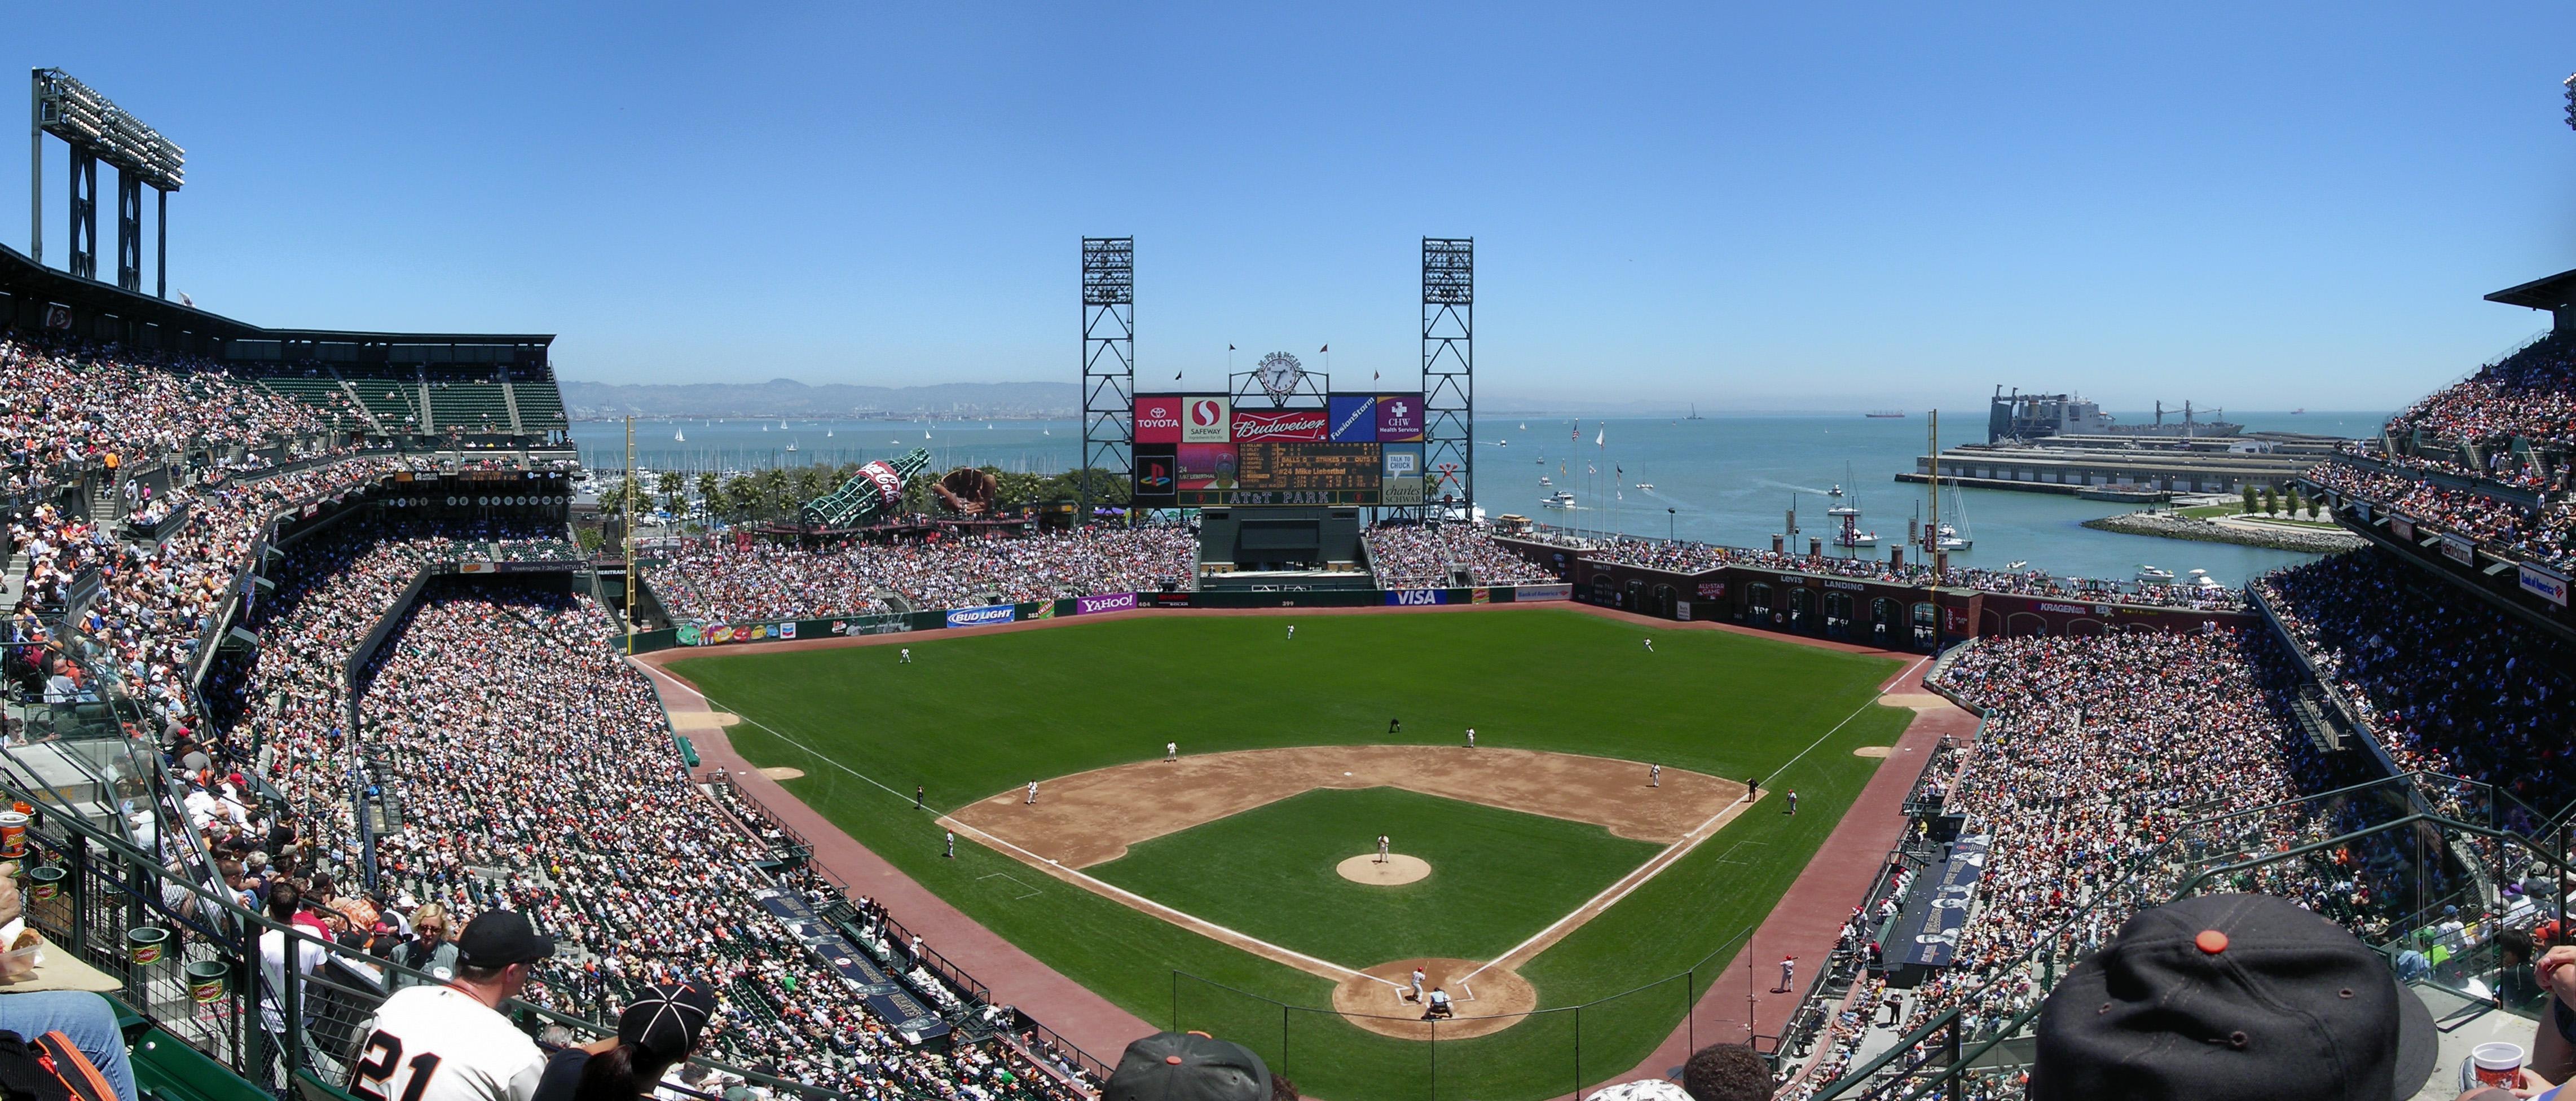 SAN FRANCISCO GIANTS mlb baseball 7 wallpaper 4567x1952 231974 4567x1952